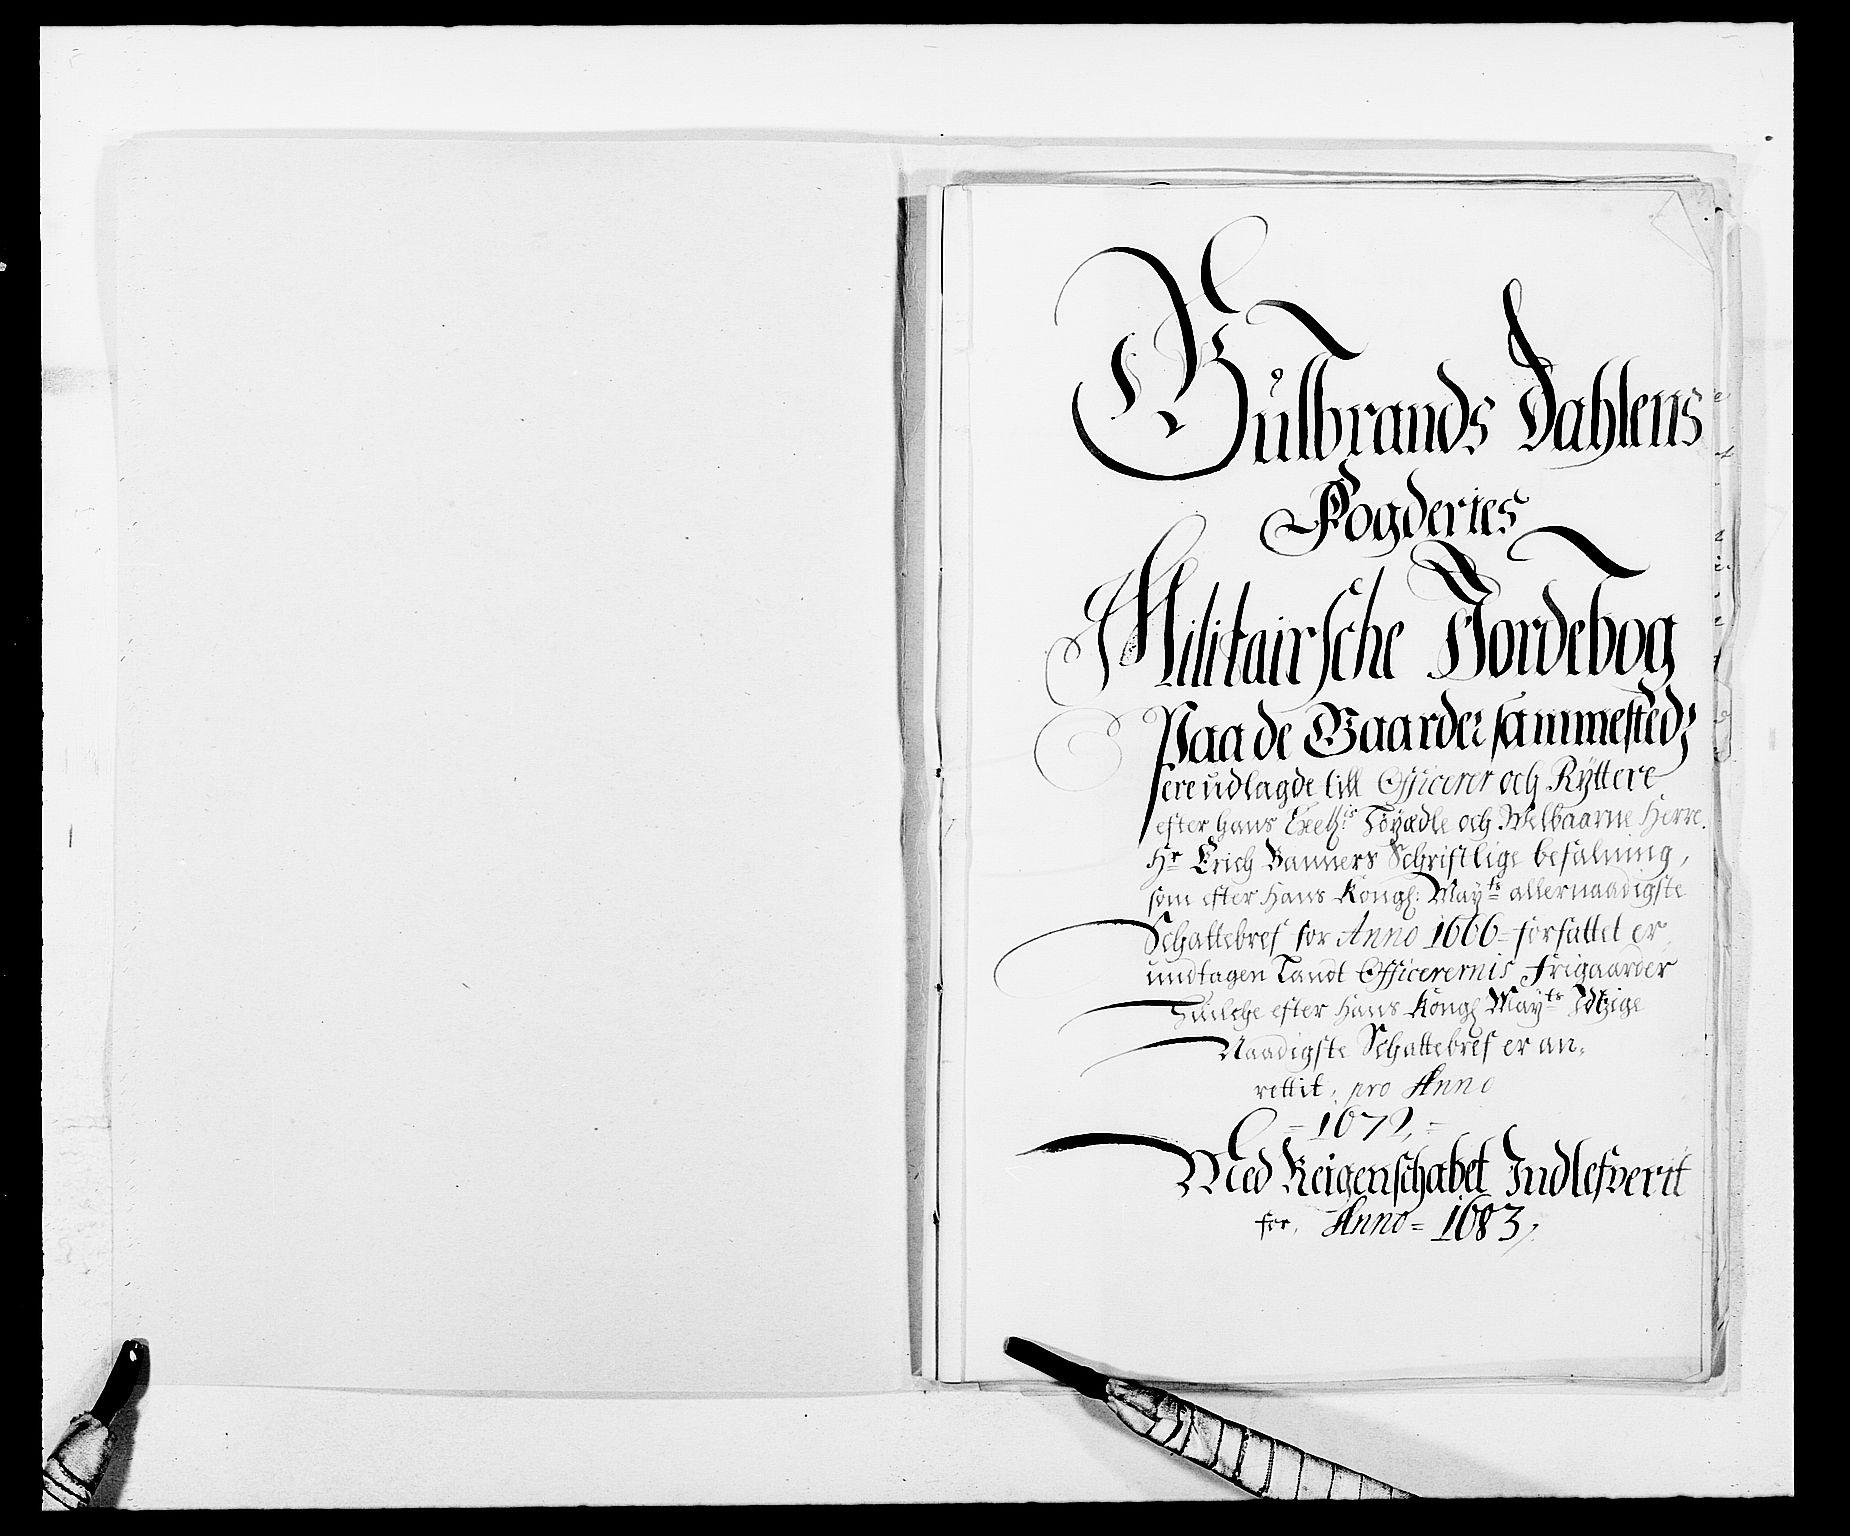 RA, Rentekammeret inntil 1814, Reviderte regnskaper, Fogderegnskap, R17/L1158: Fogderegnskap Gudbrandsdal, 1682-1689, s. 298